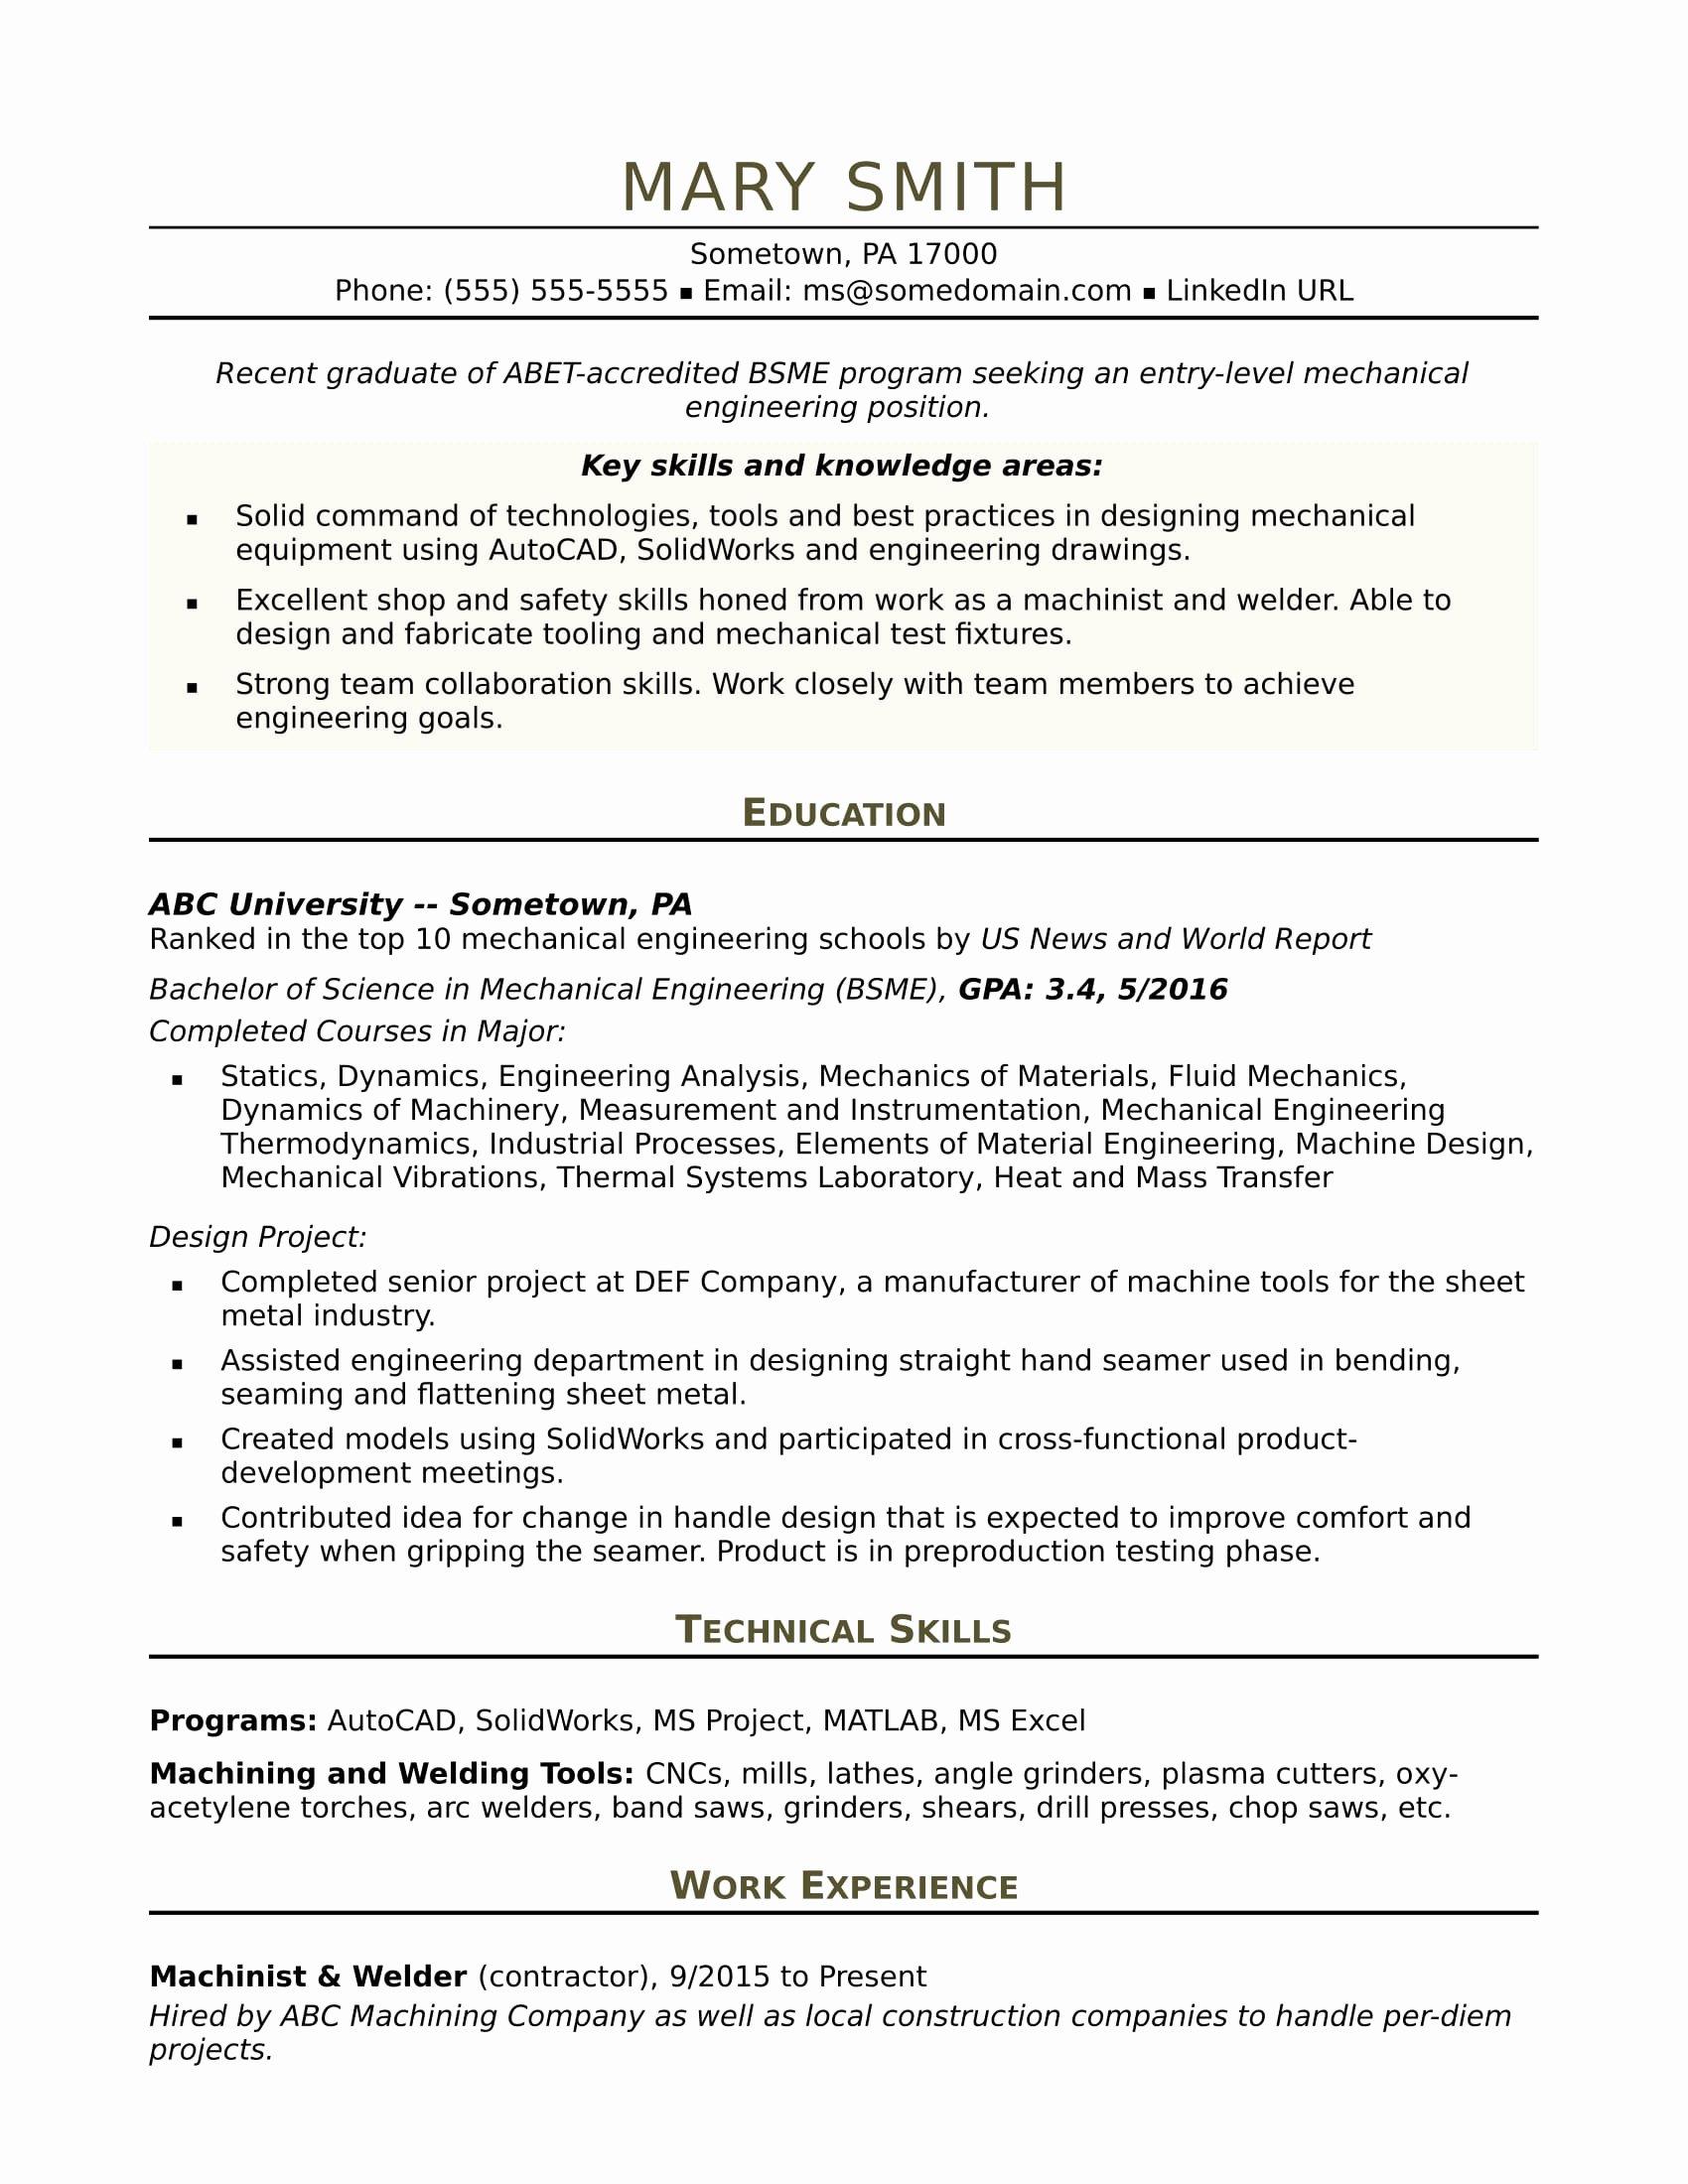 Sample Resume for An Entry Level Mechanical Engineer